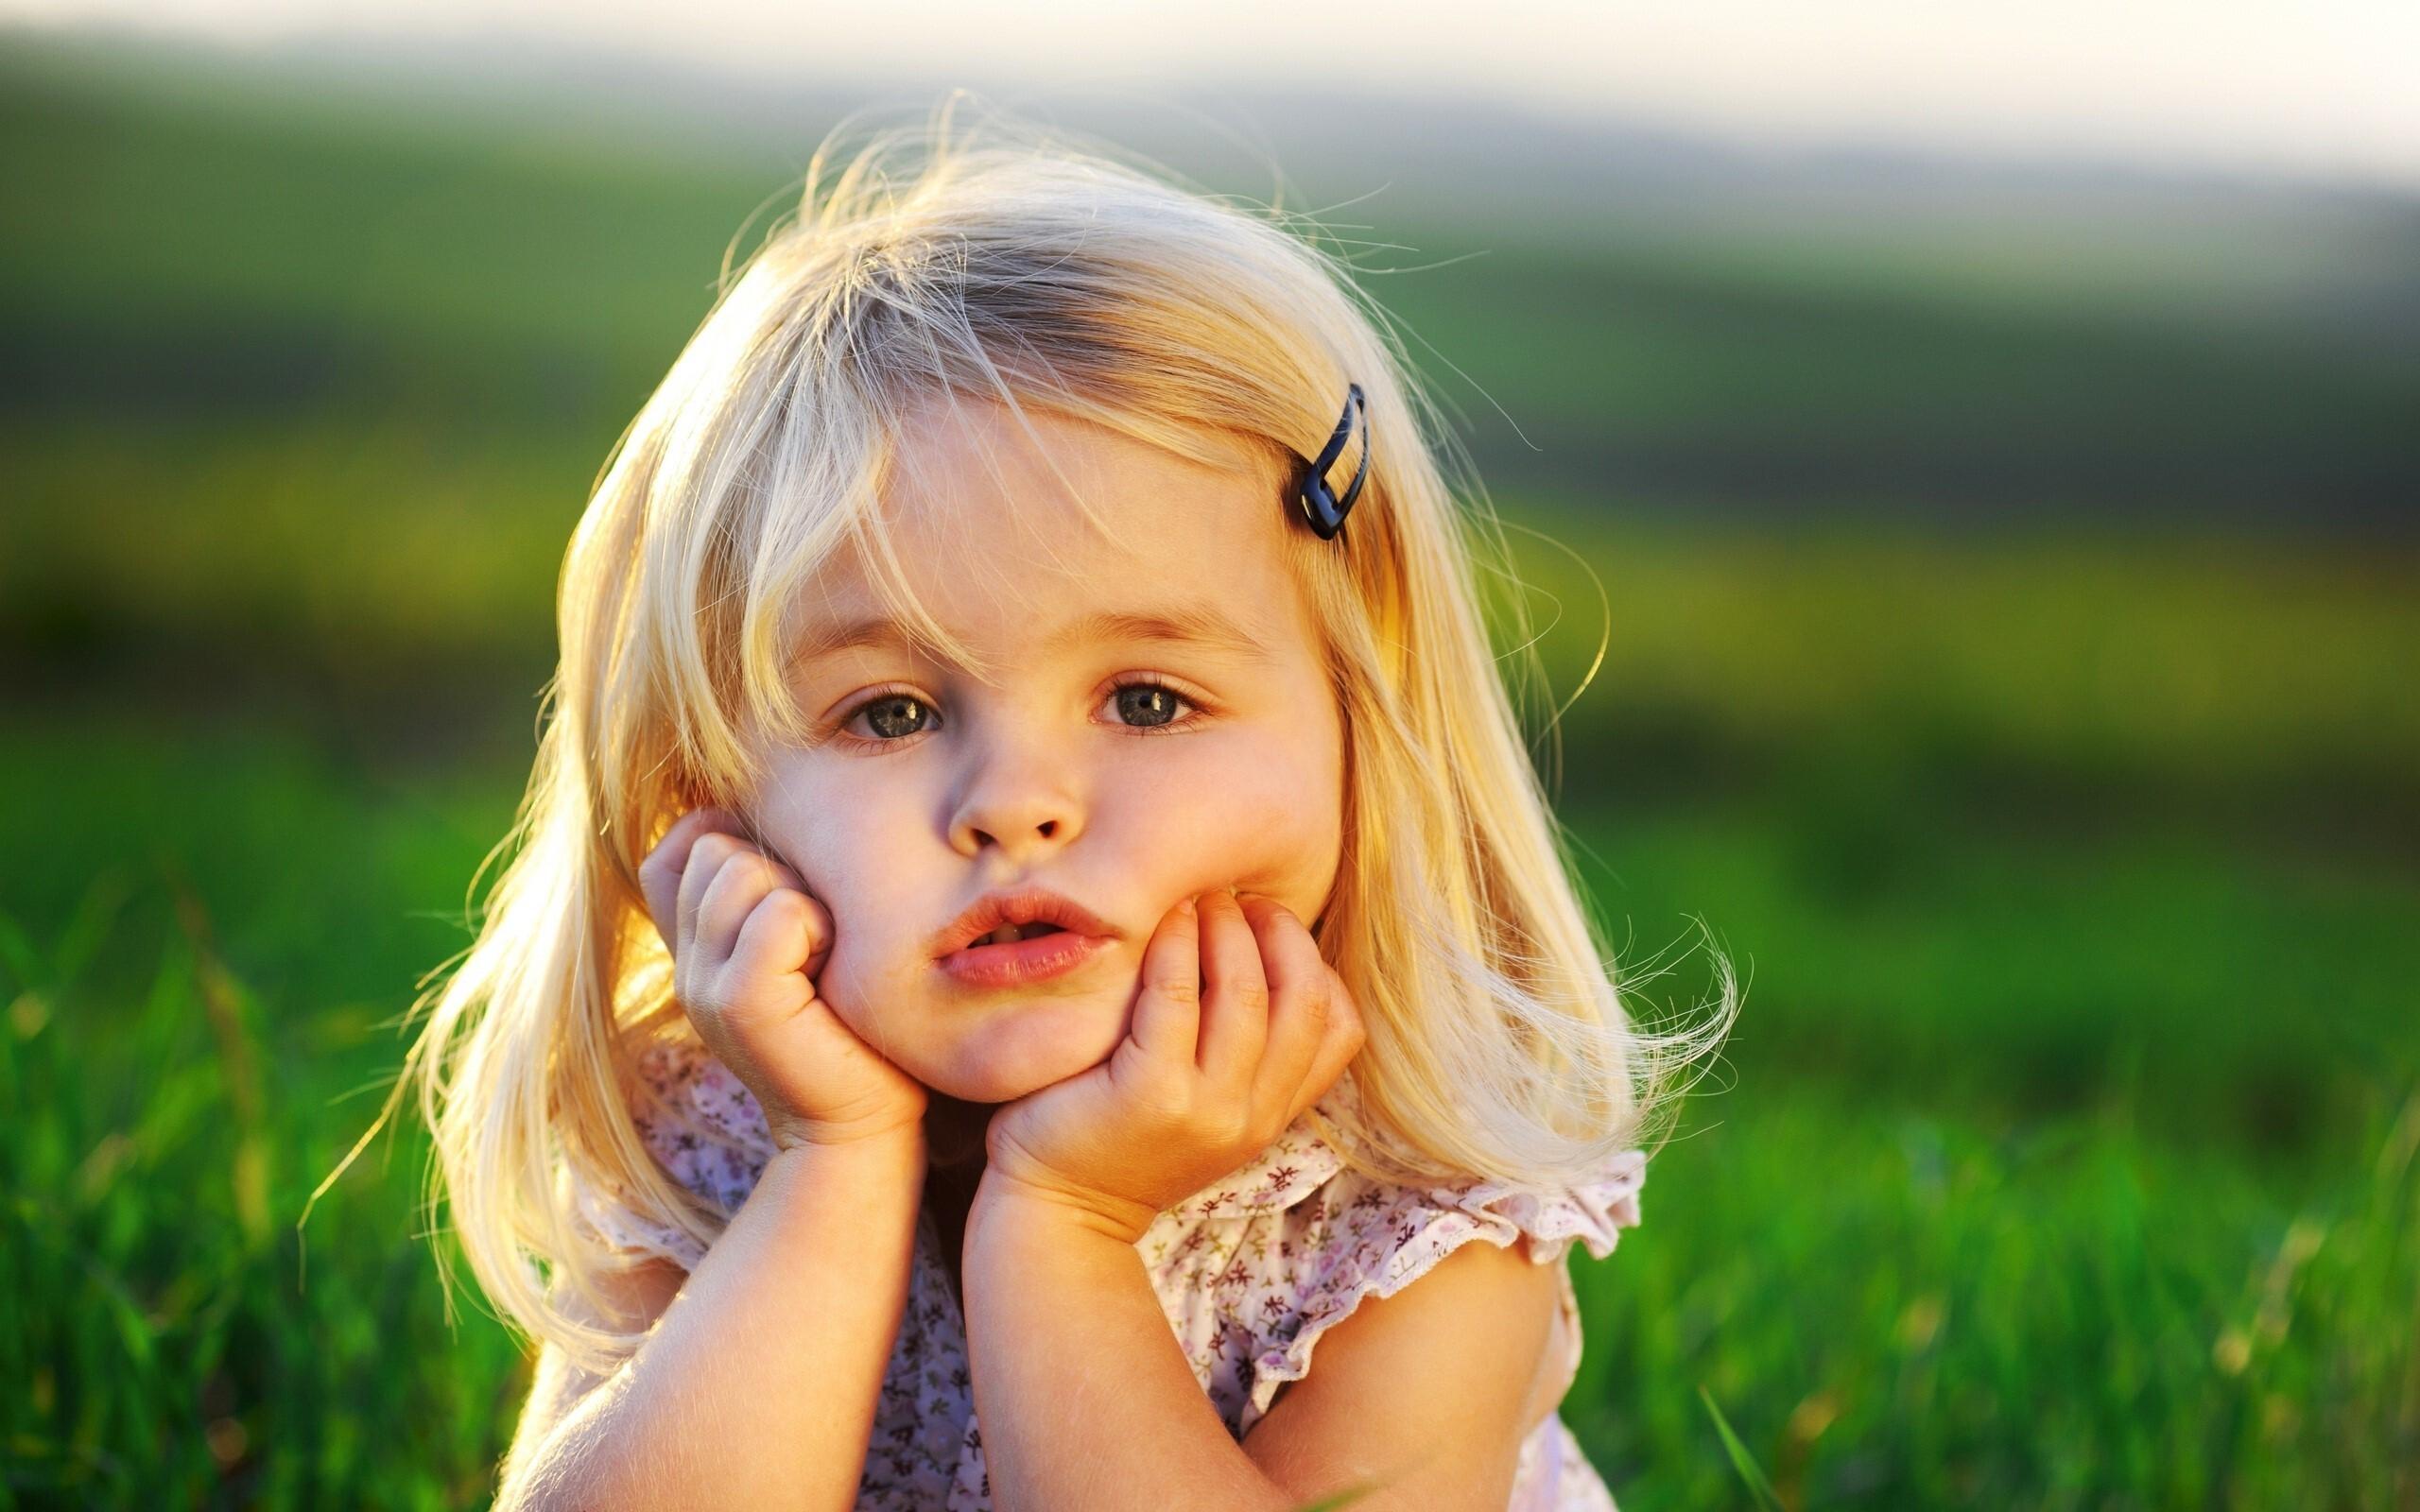 Cute Baby Girl HD Wallpaper | HD Wallpapers